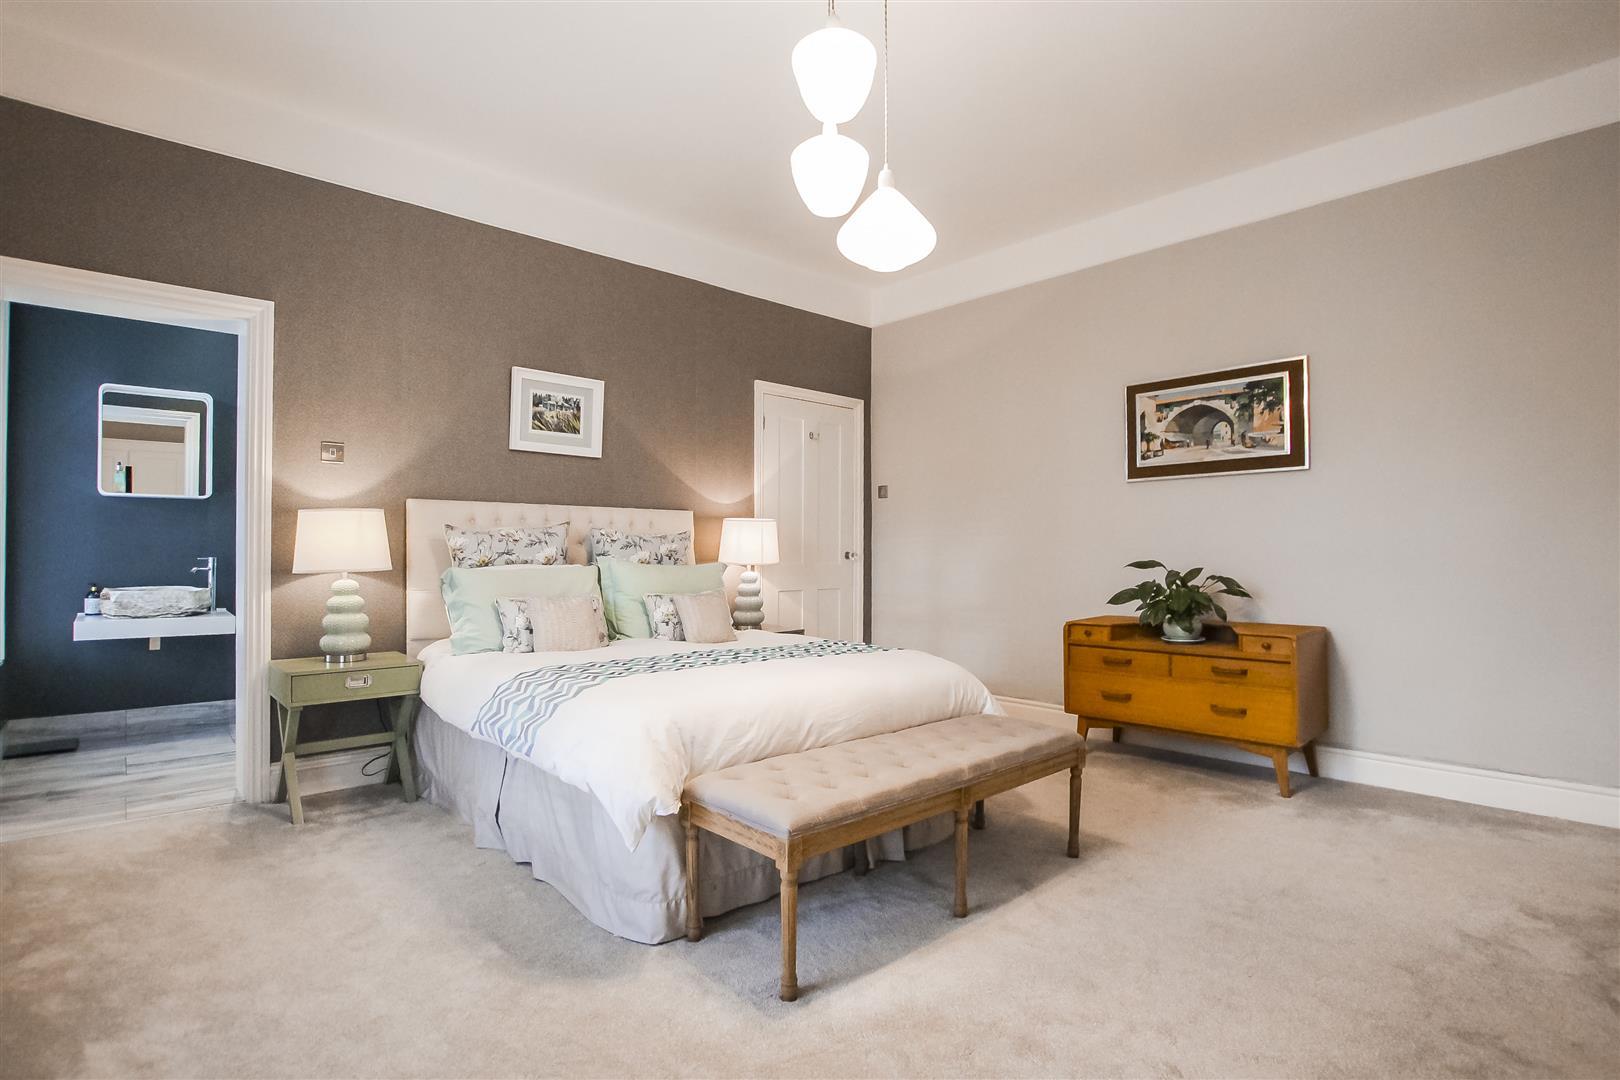 5 Bedroom Detached House For Sale - Bedroom 1